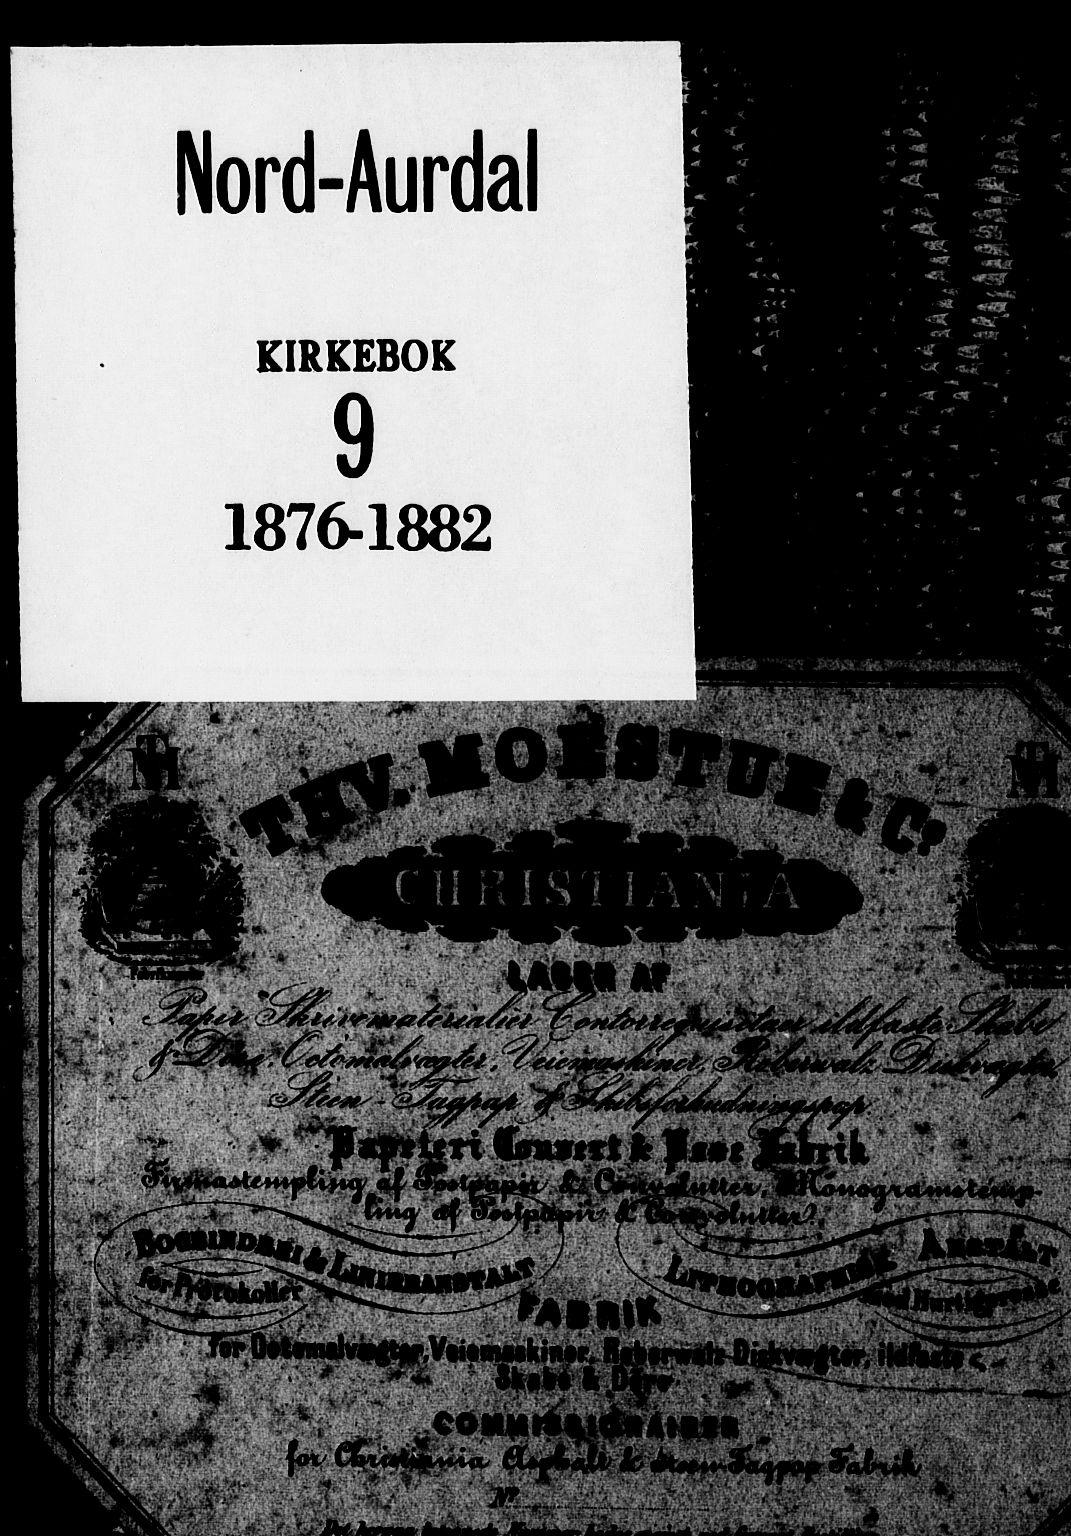 SAH, Nord-Aurdal prestekontor, Ministerialbok nr. 9, 1876-1882